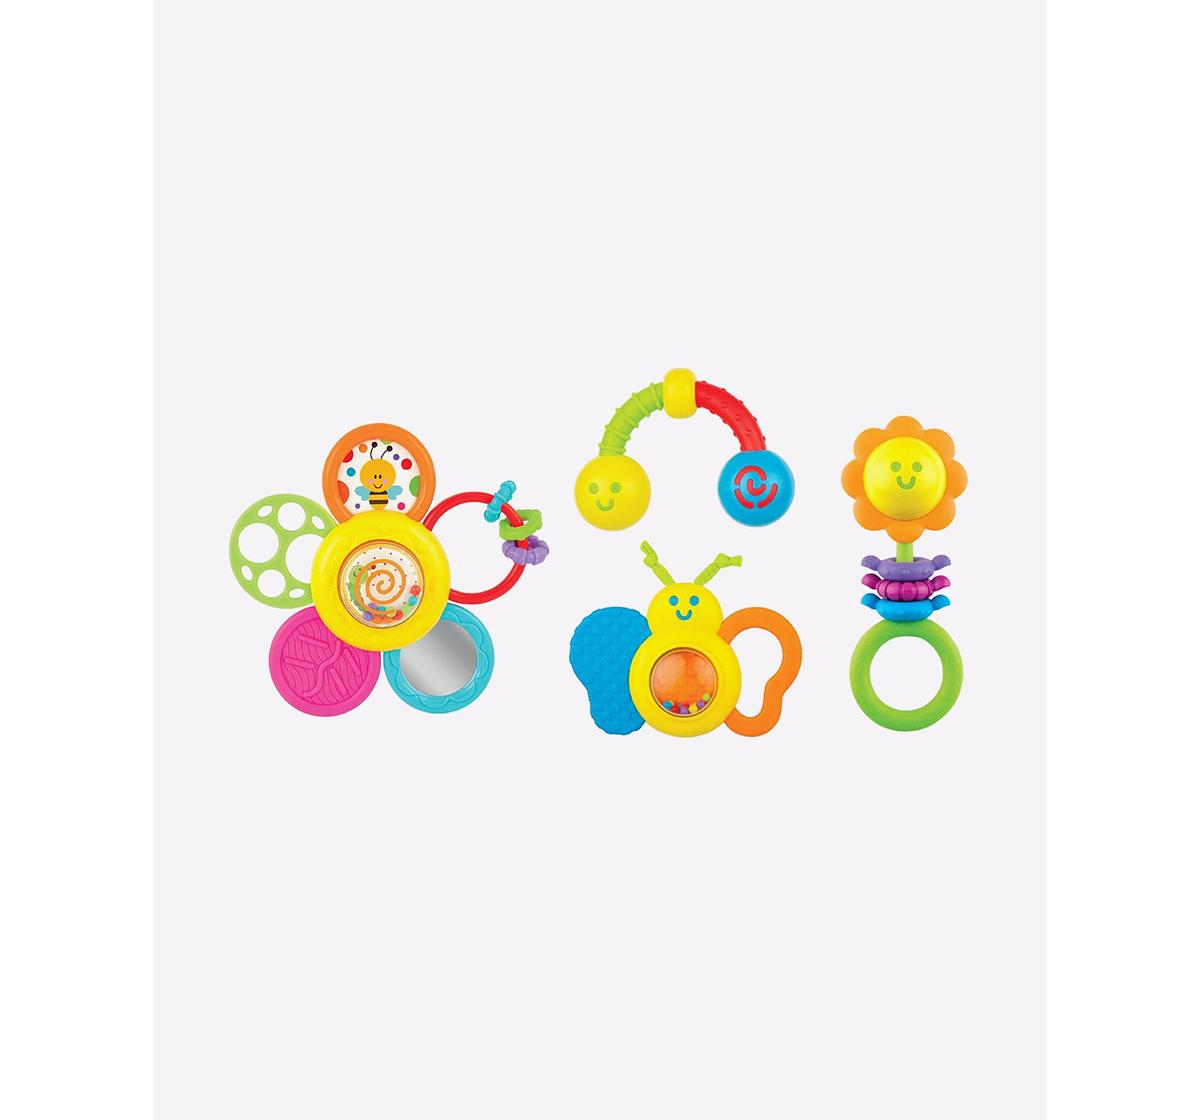 WinFun | Winfun Gardenpals Rattle Giftset New Born for Kids age 0M+